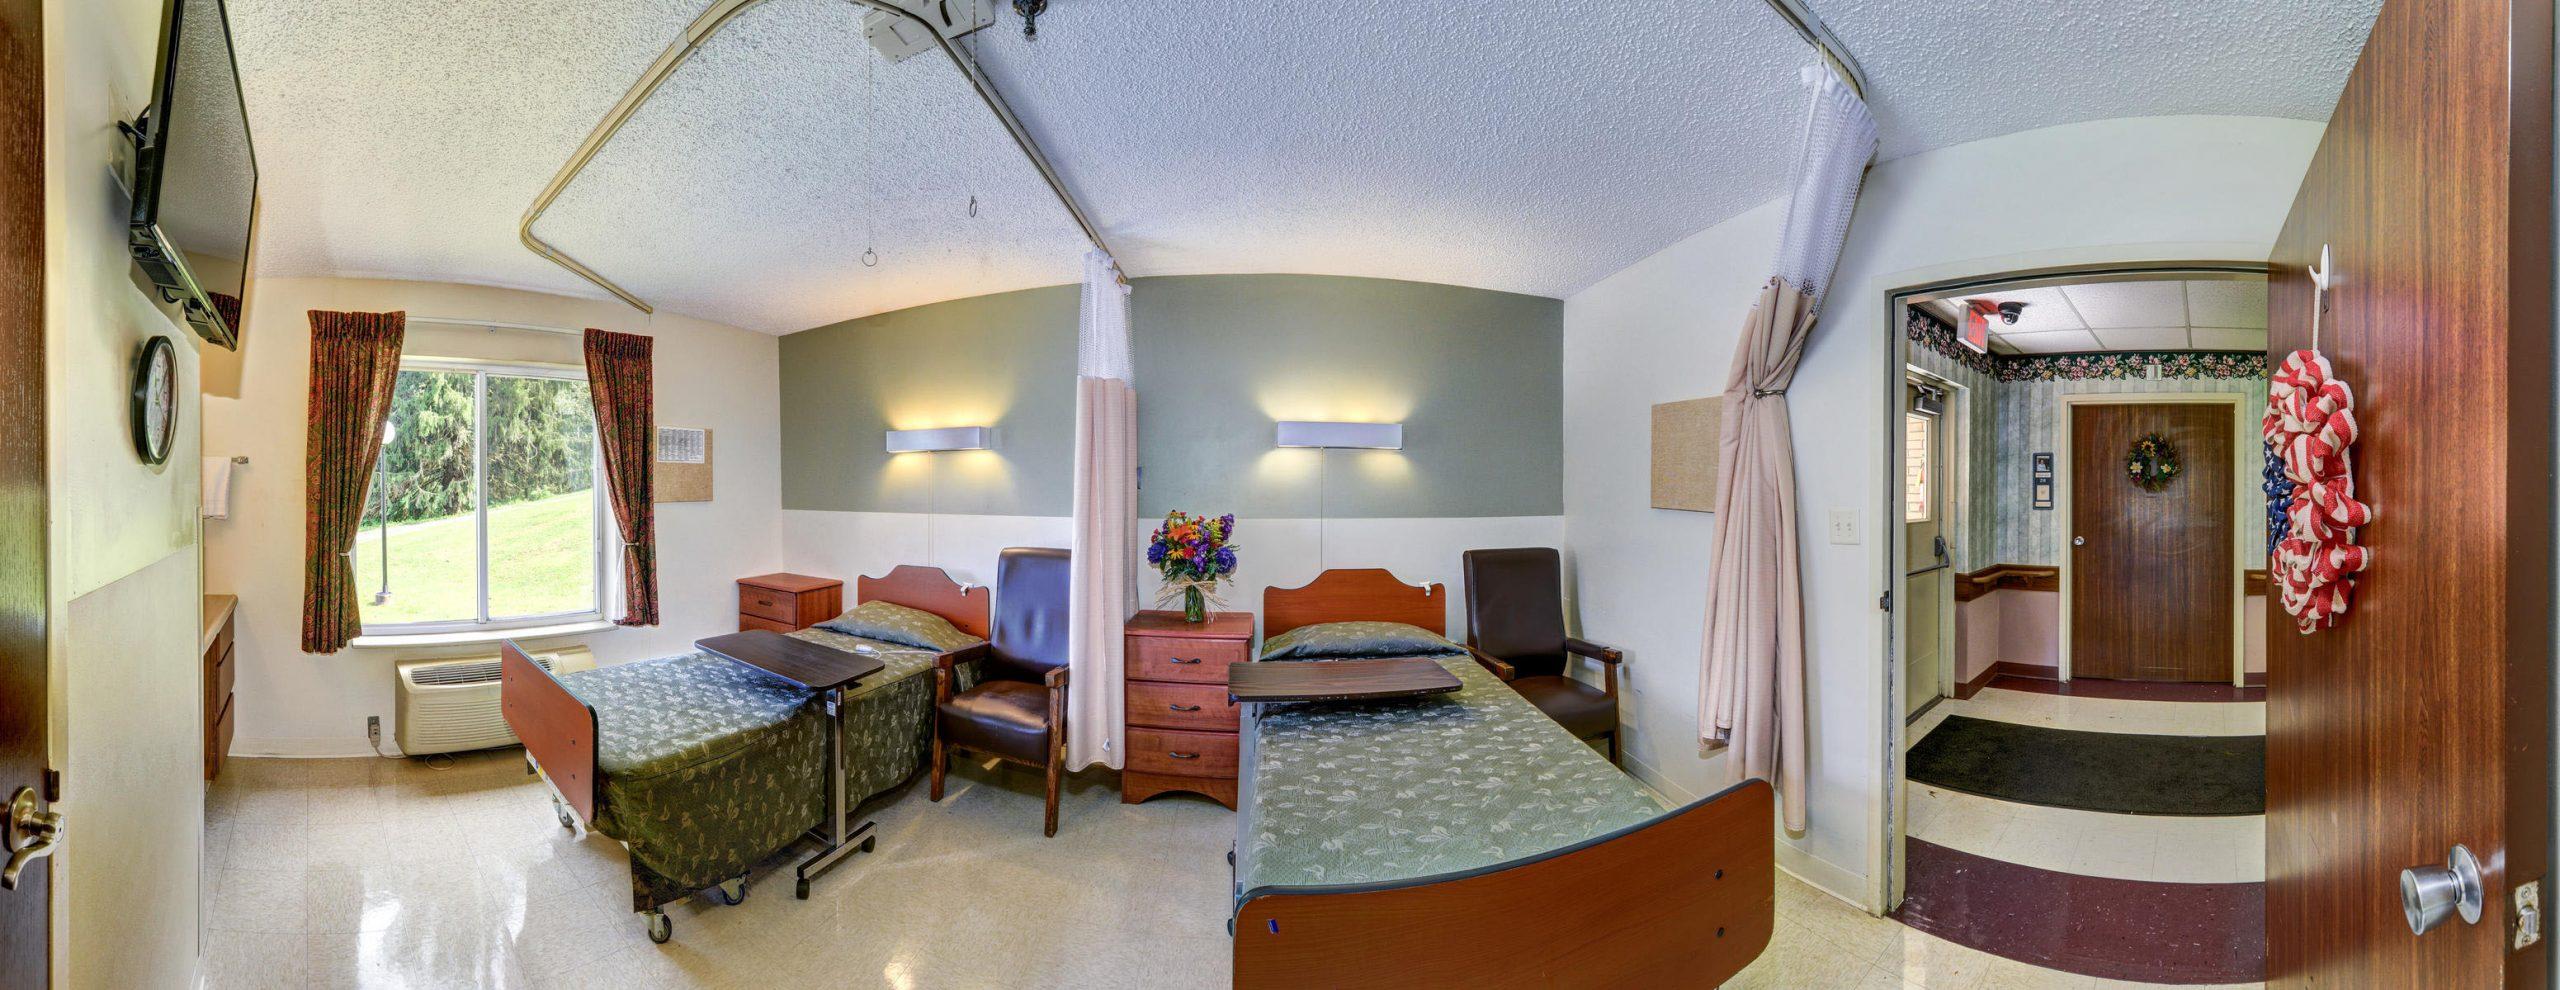 Panoramic view of Stonerise Wellsburg patient room open to hallway